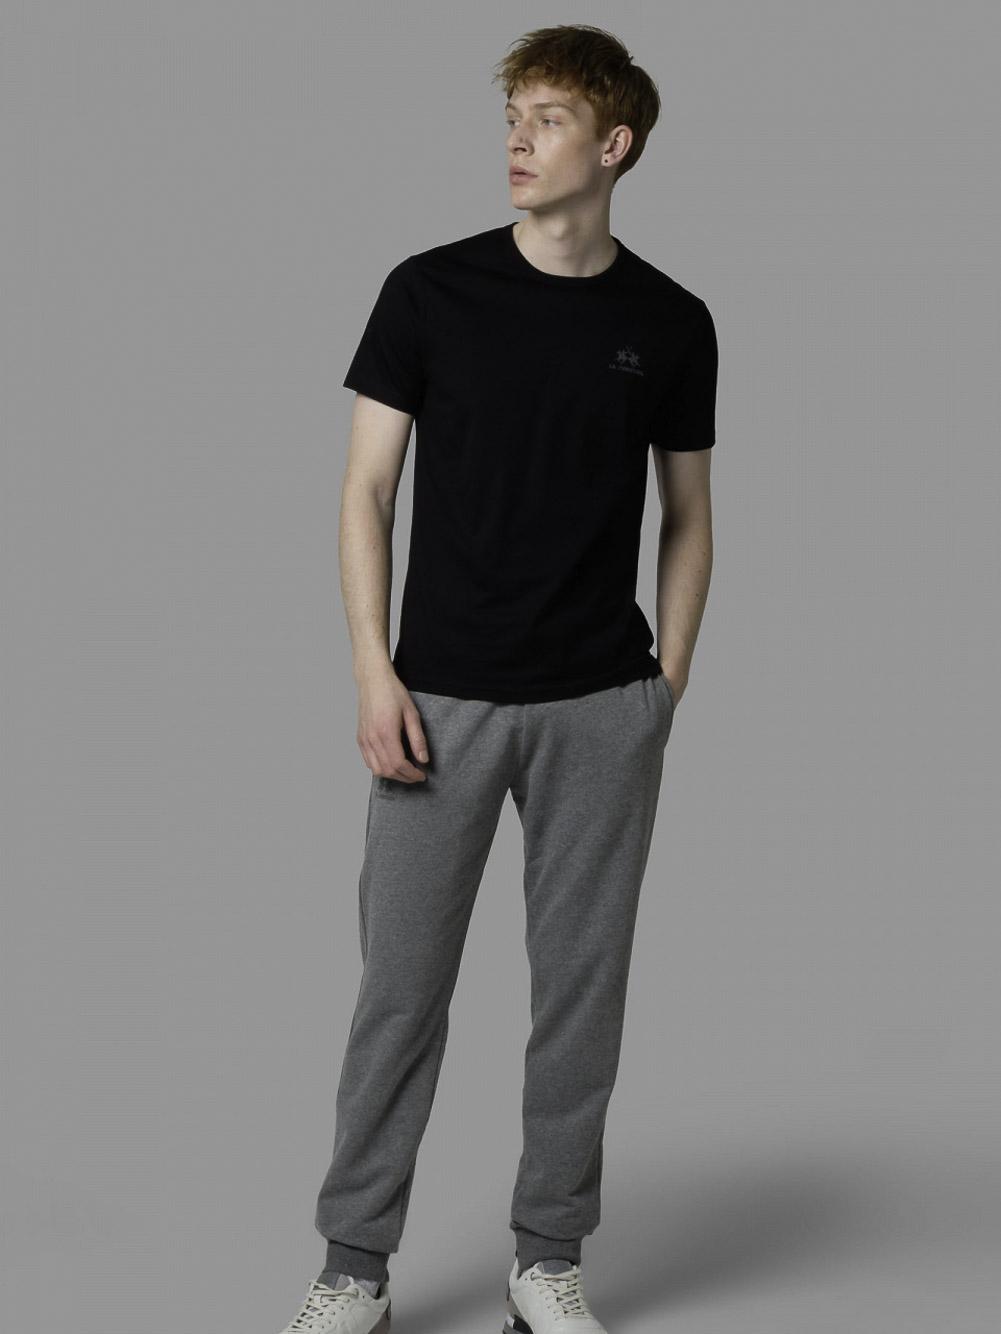 LA MARTINA Μπλούζα t-shirt 3LMCCMR02-9999 ΜΑΥΡΟ